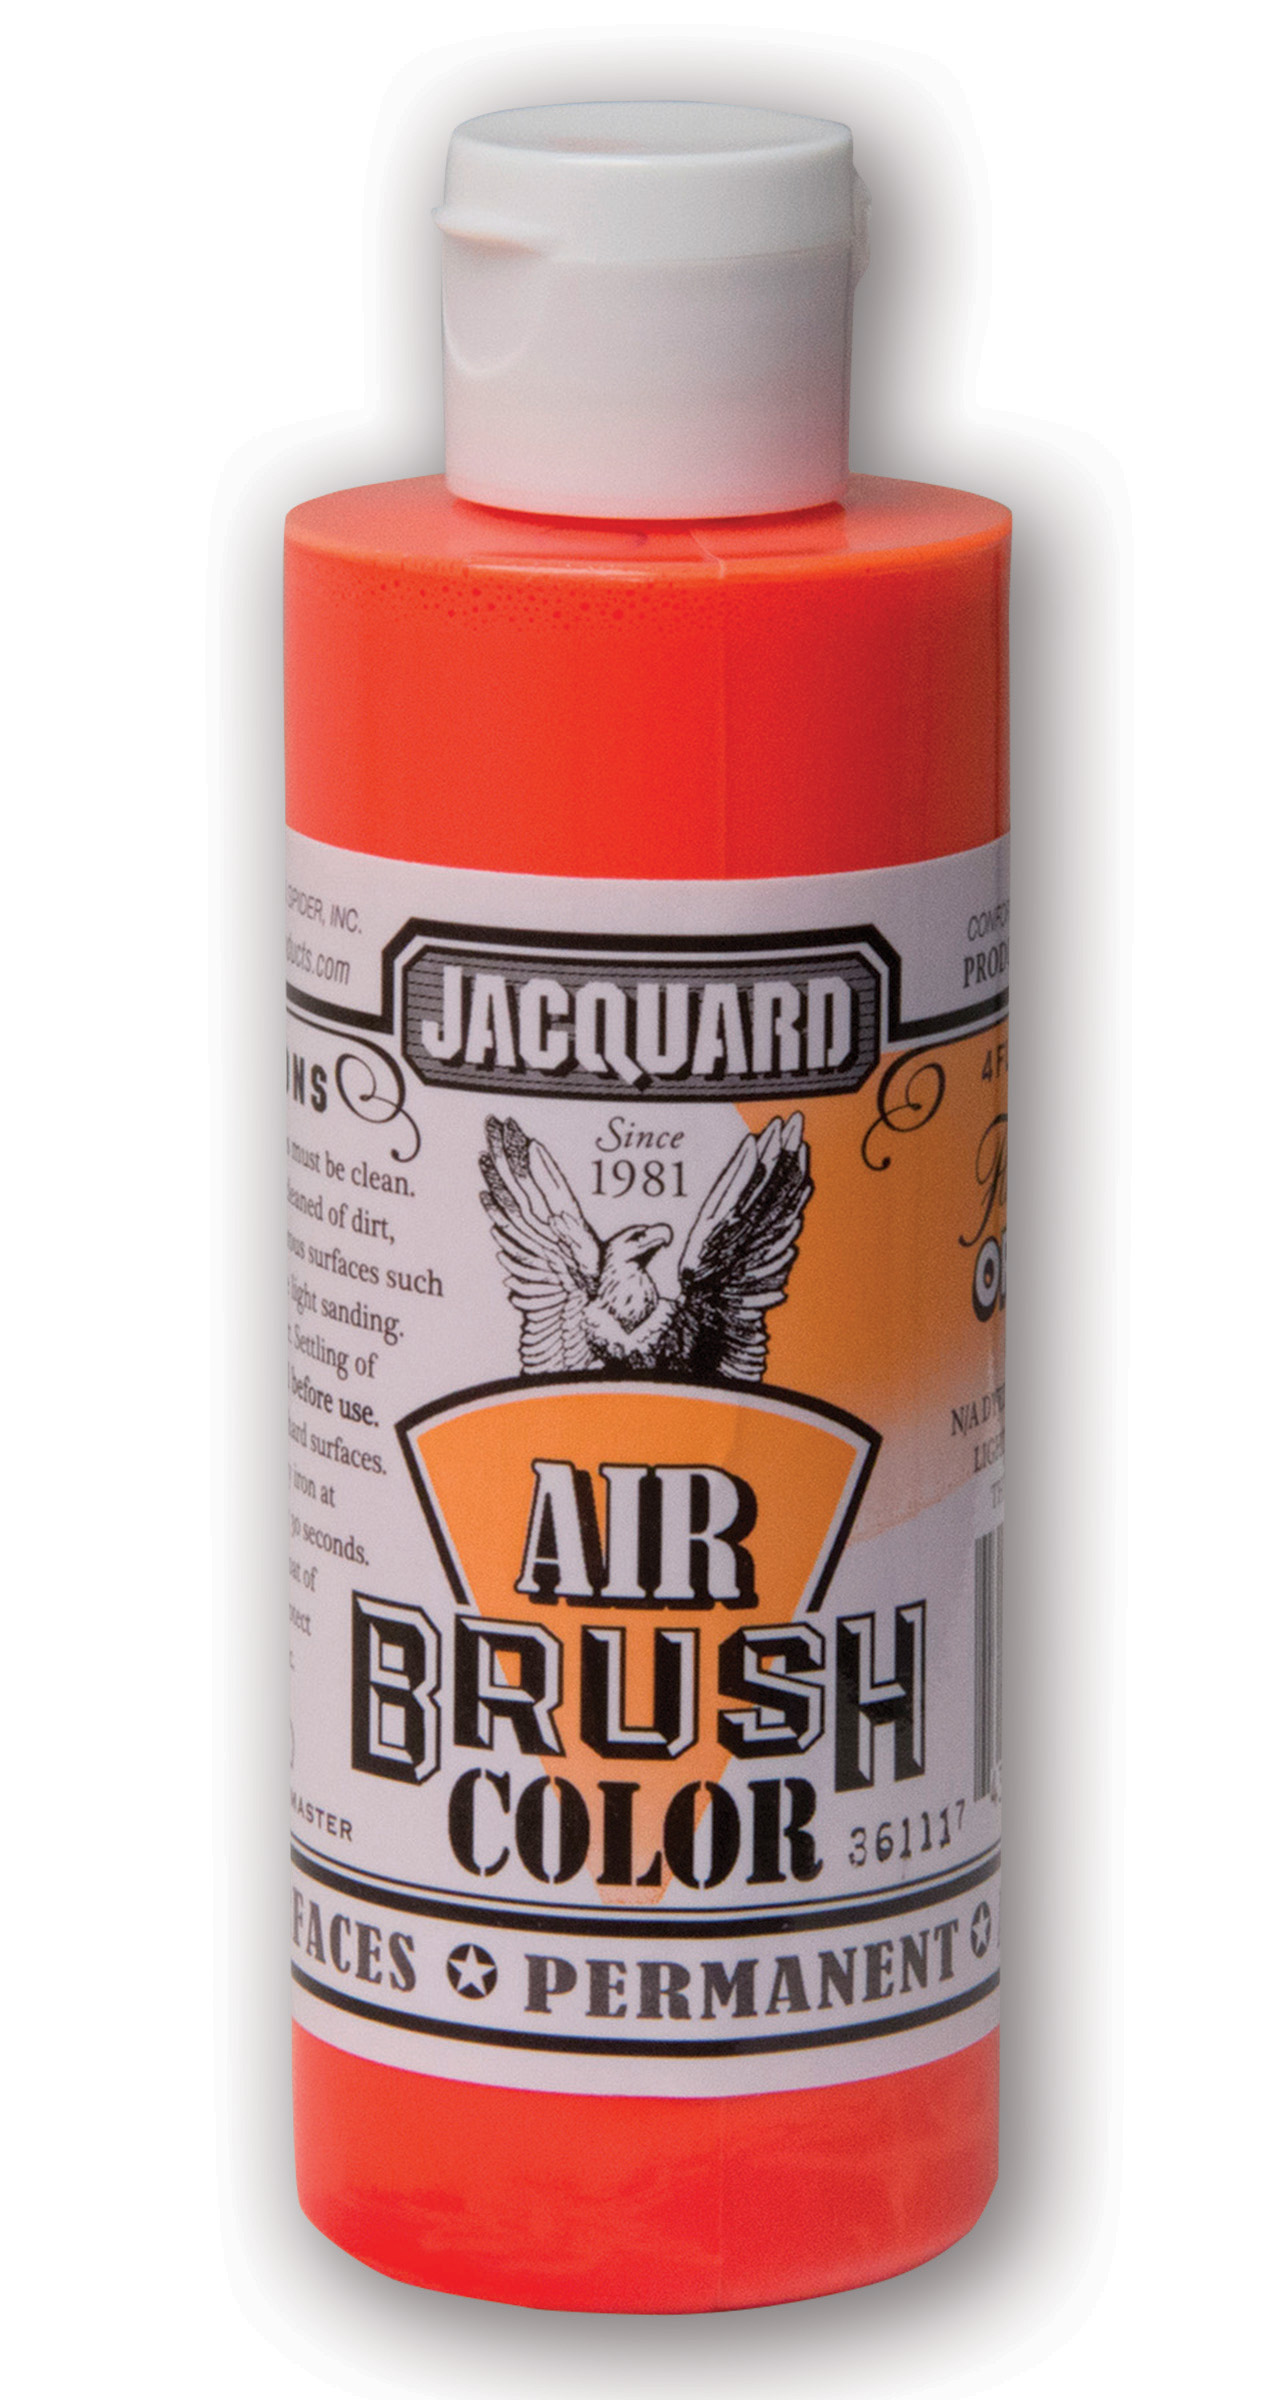 PapierSchereStoff - Jacquard Products Airbrush Color Flüssigfarbe ...